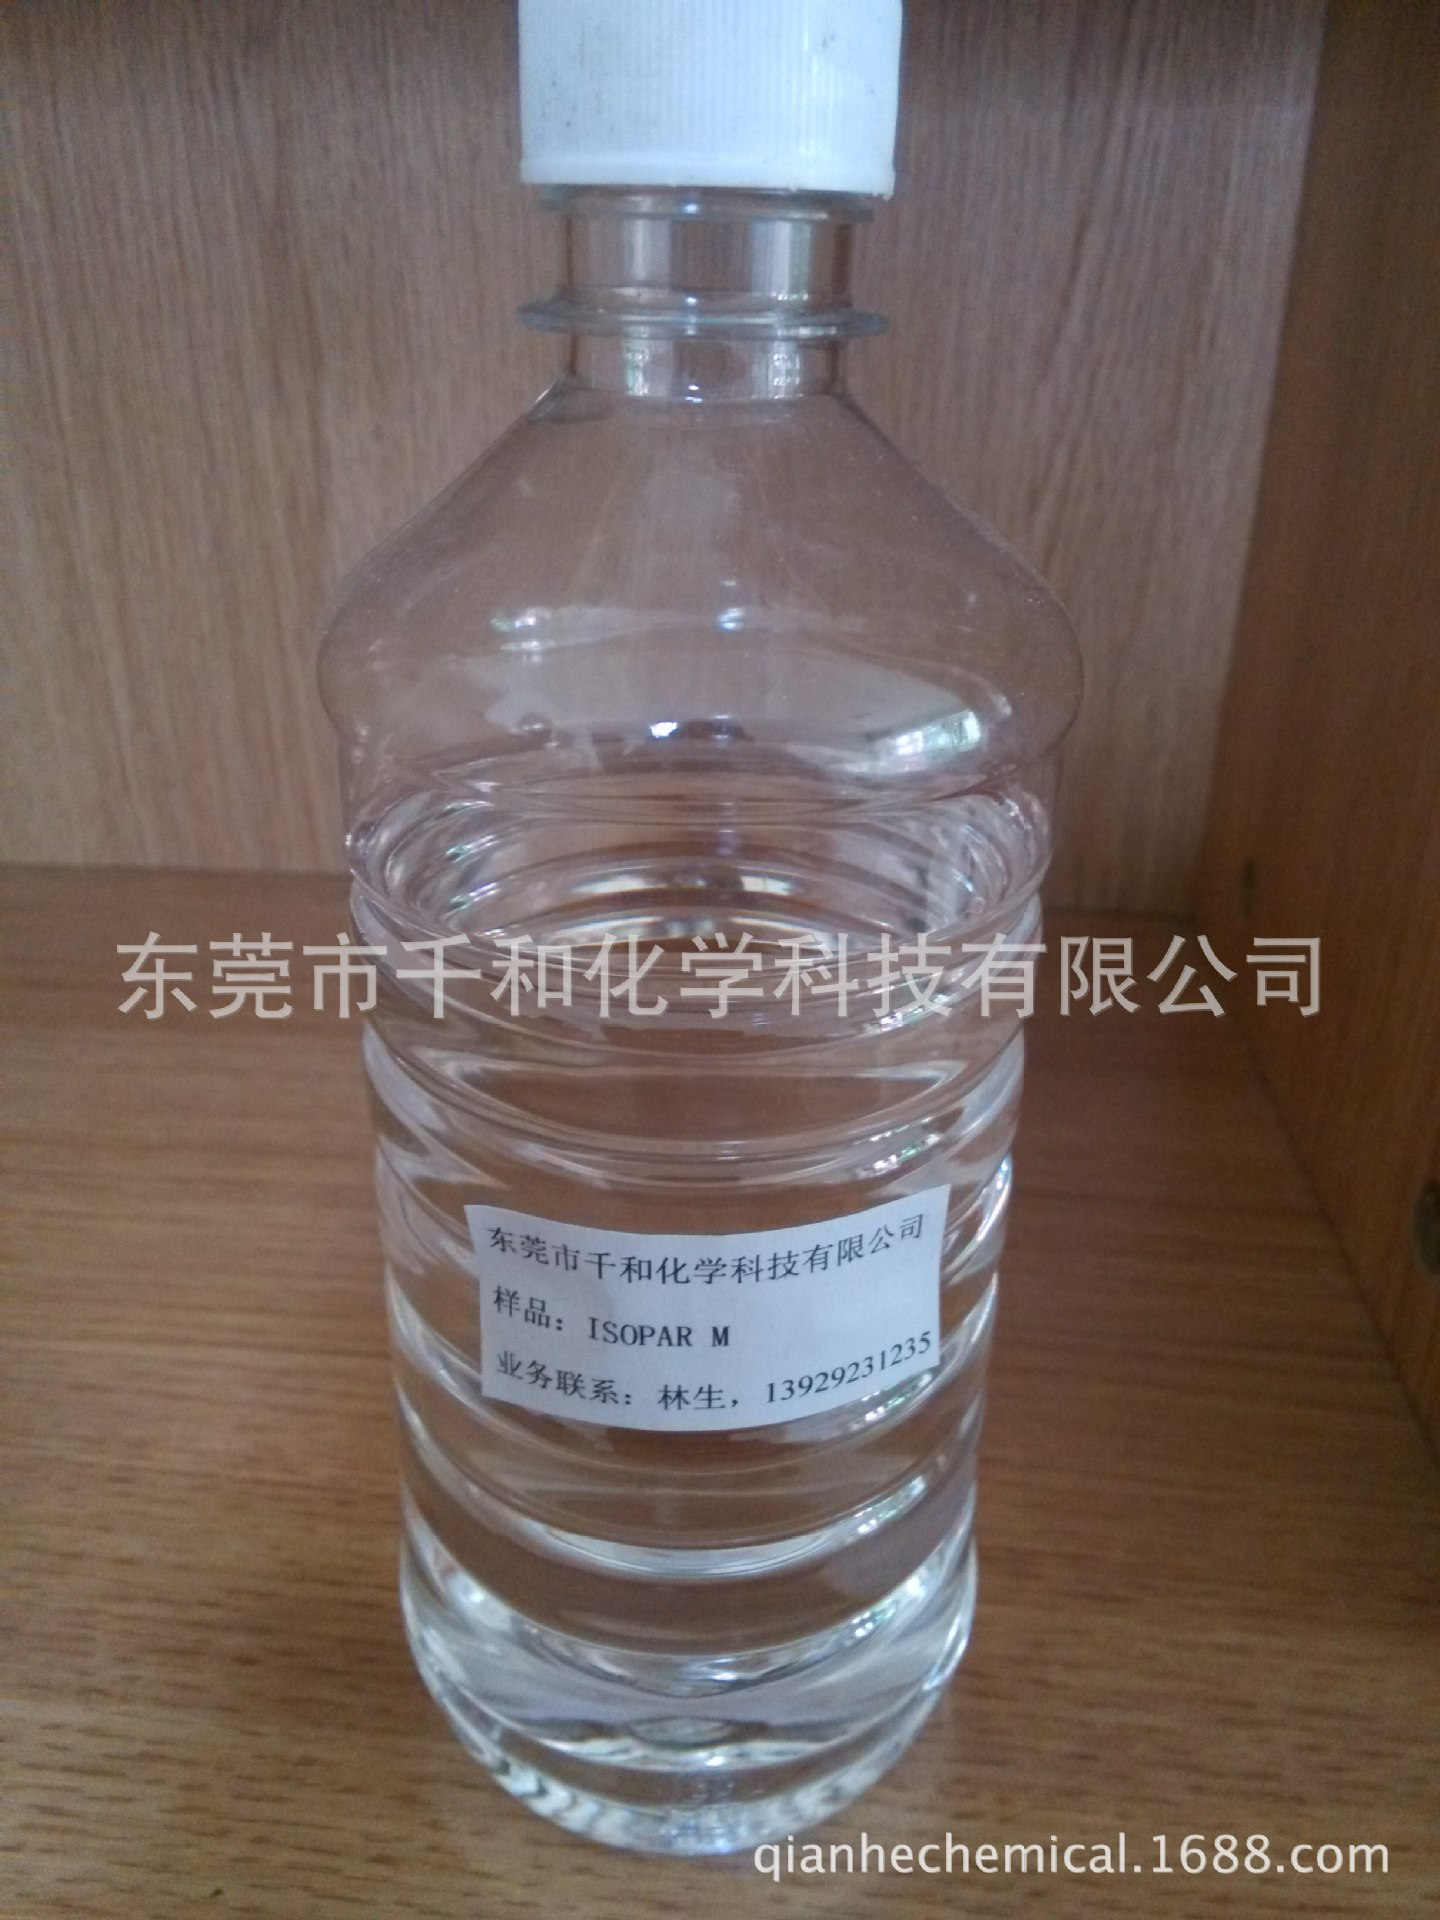 Nhóm hữu cơ (Hydrôcacbon) Liquid mosquito repellent solvent Exxon sixteen alkyl Isopar M Mobil heter